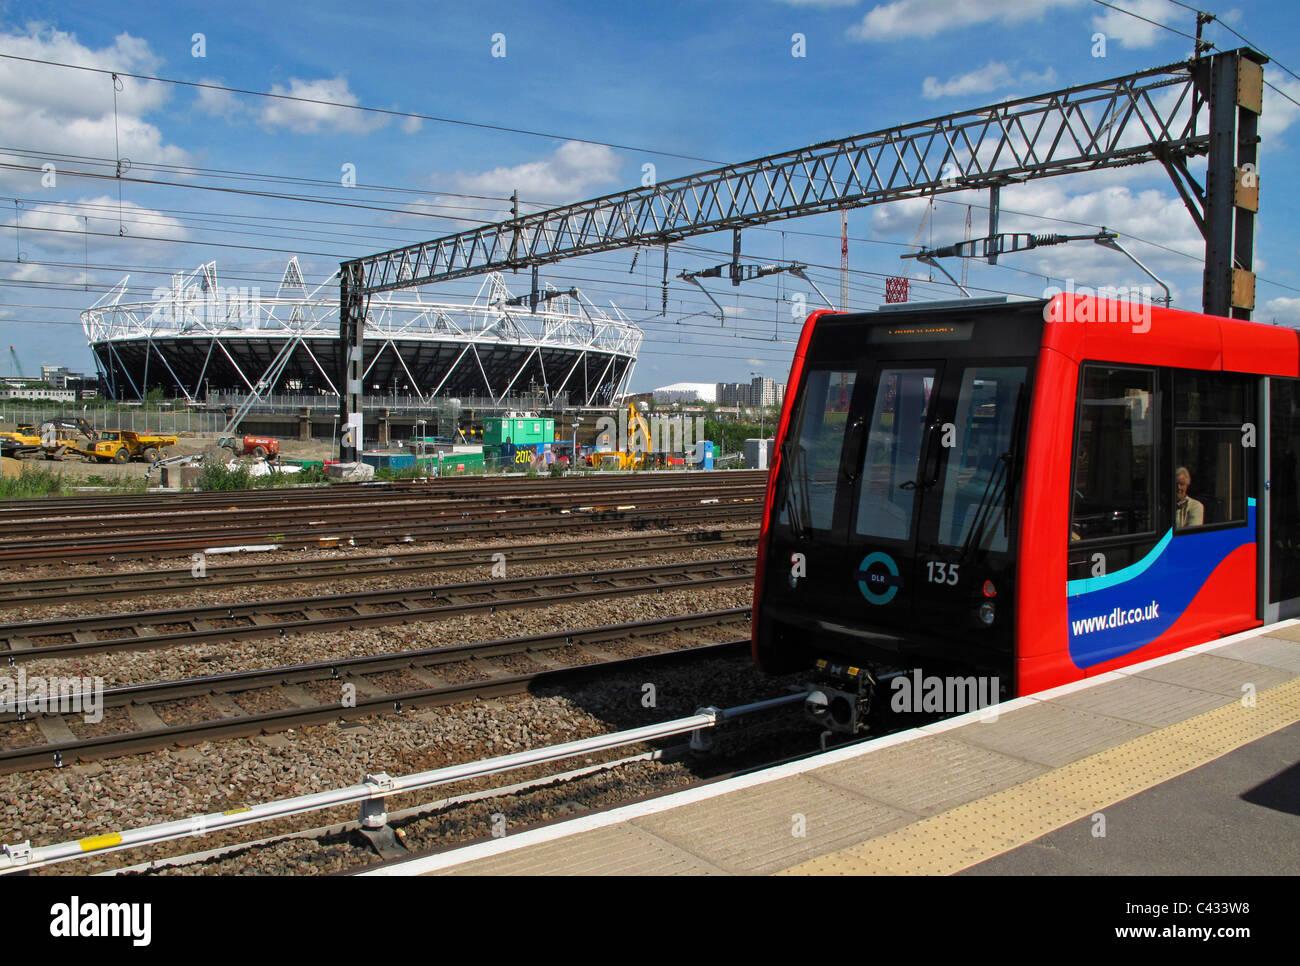 Olympic stadium and DLR train, London, England - Stock Image